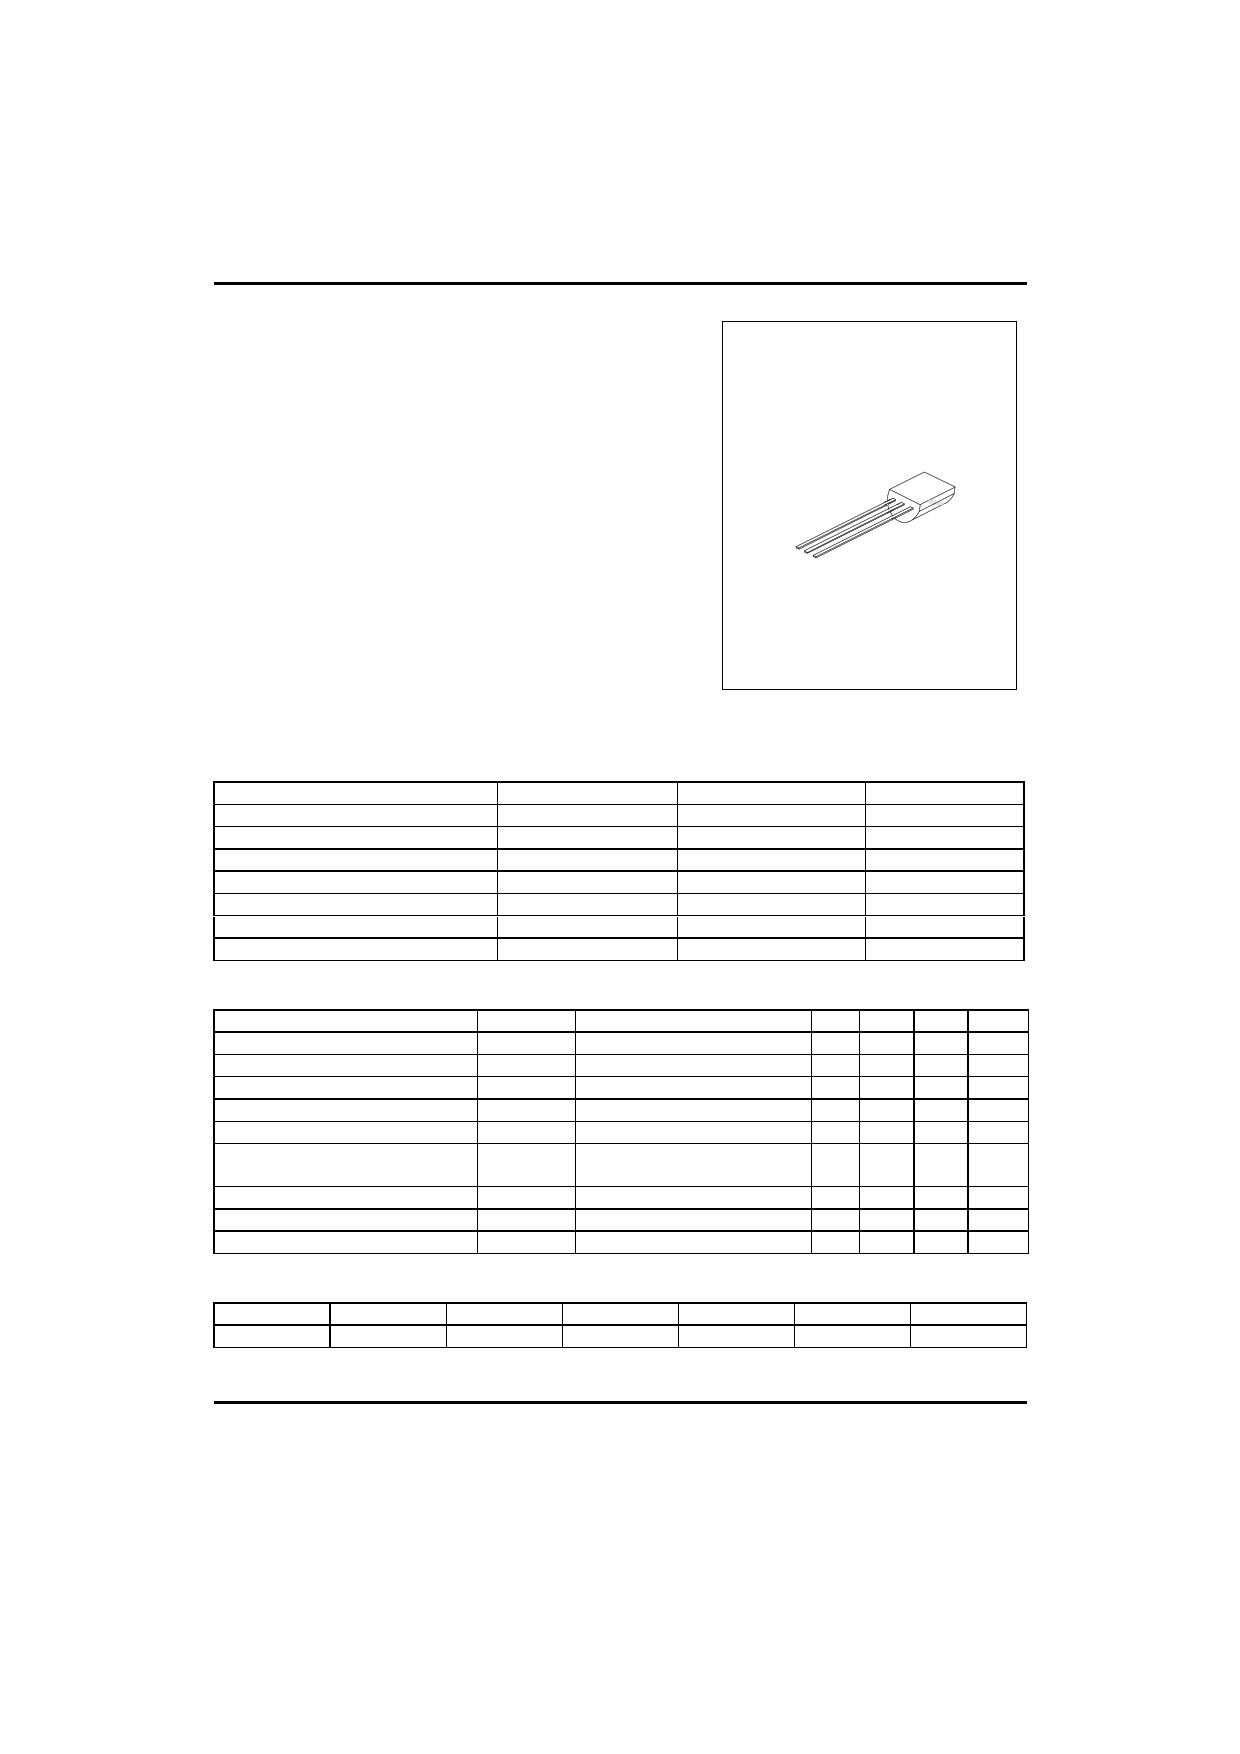 9012H datasheet